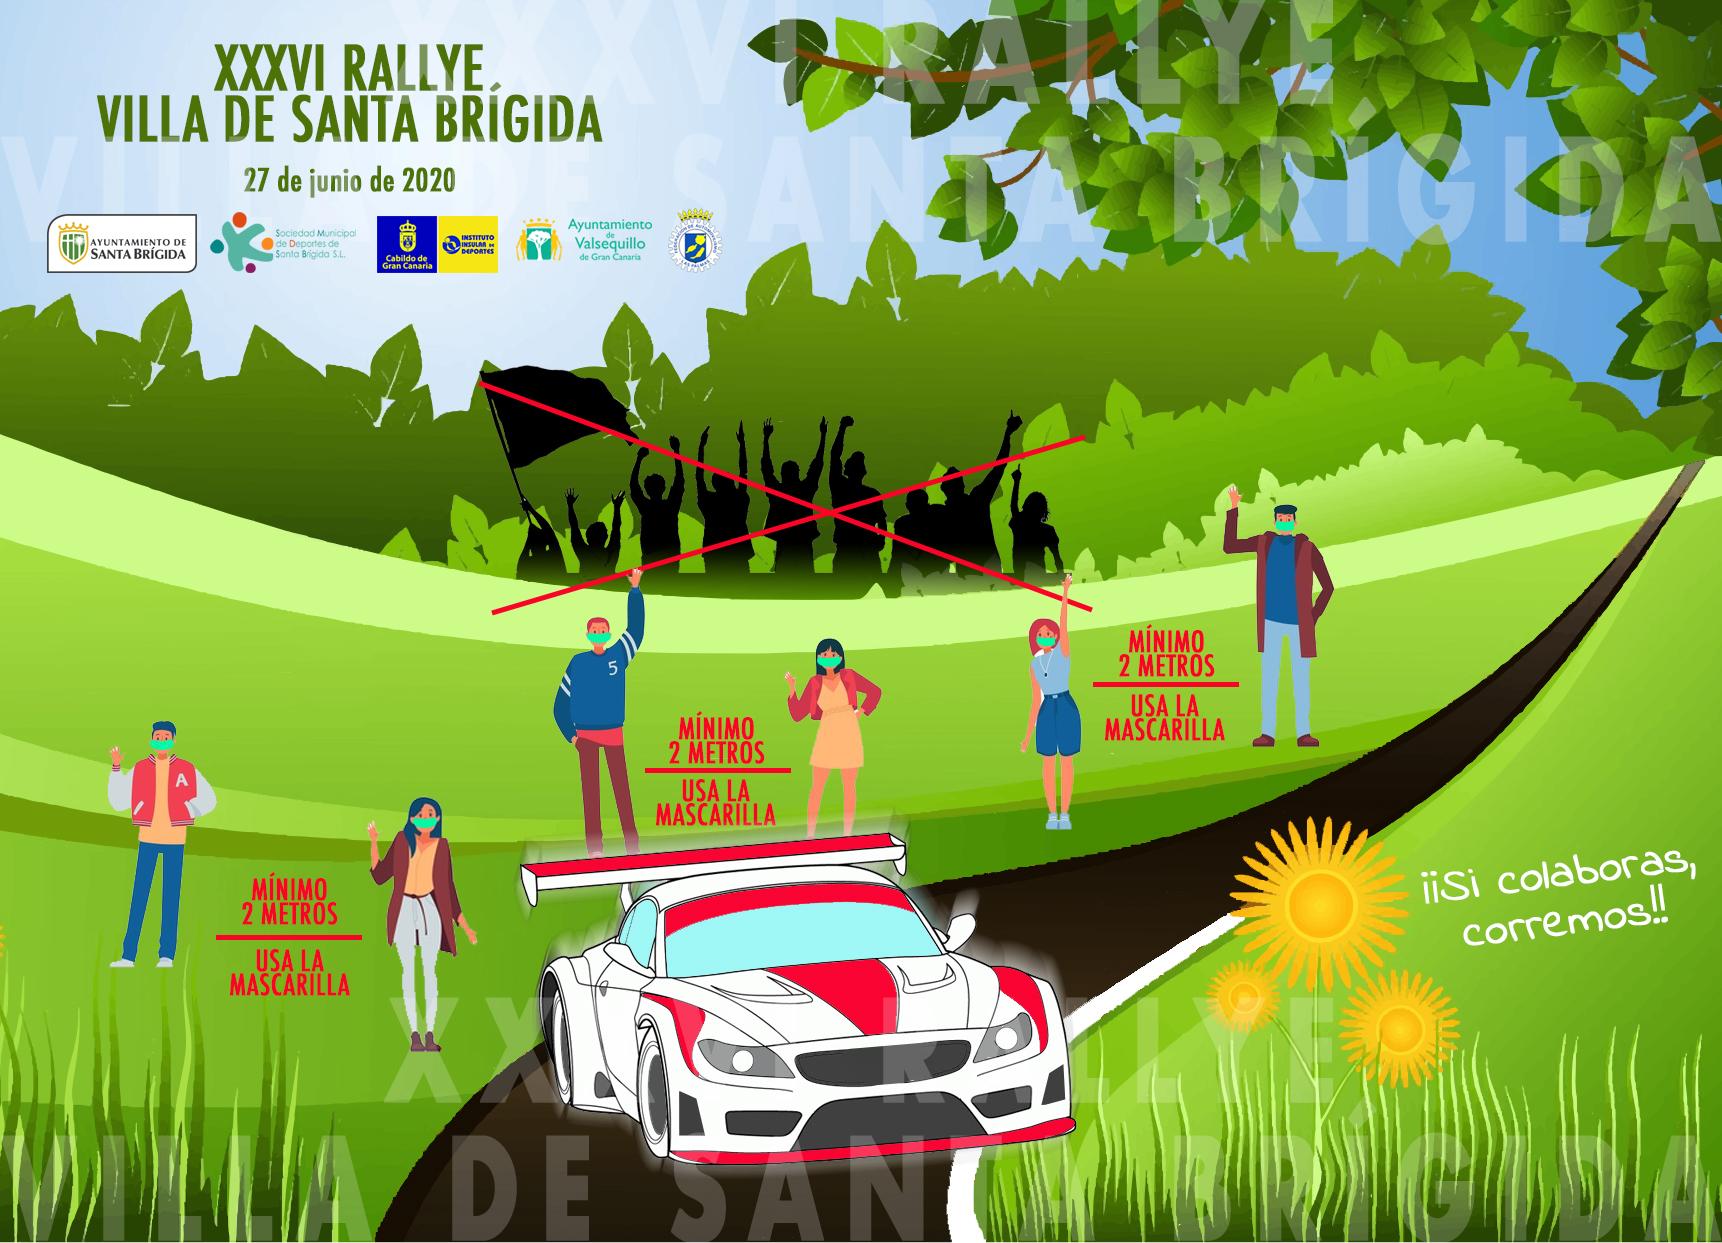 Rallye Villa de Santa Brígida 2020